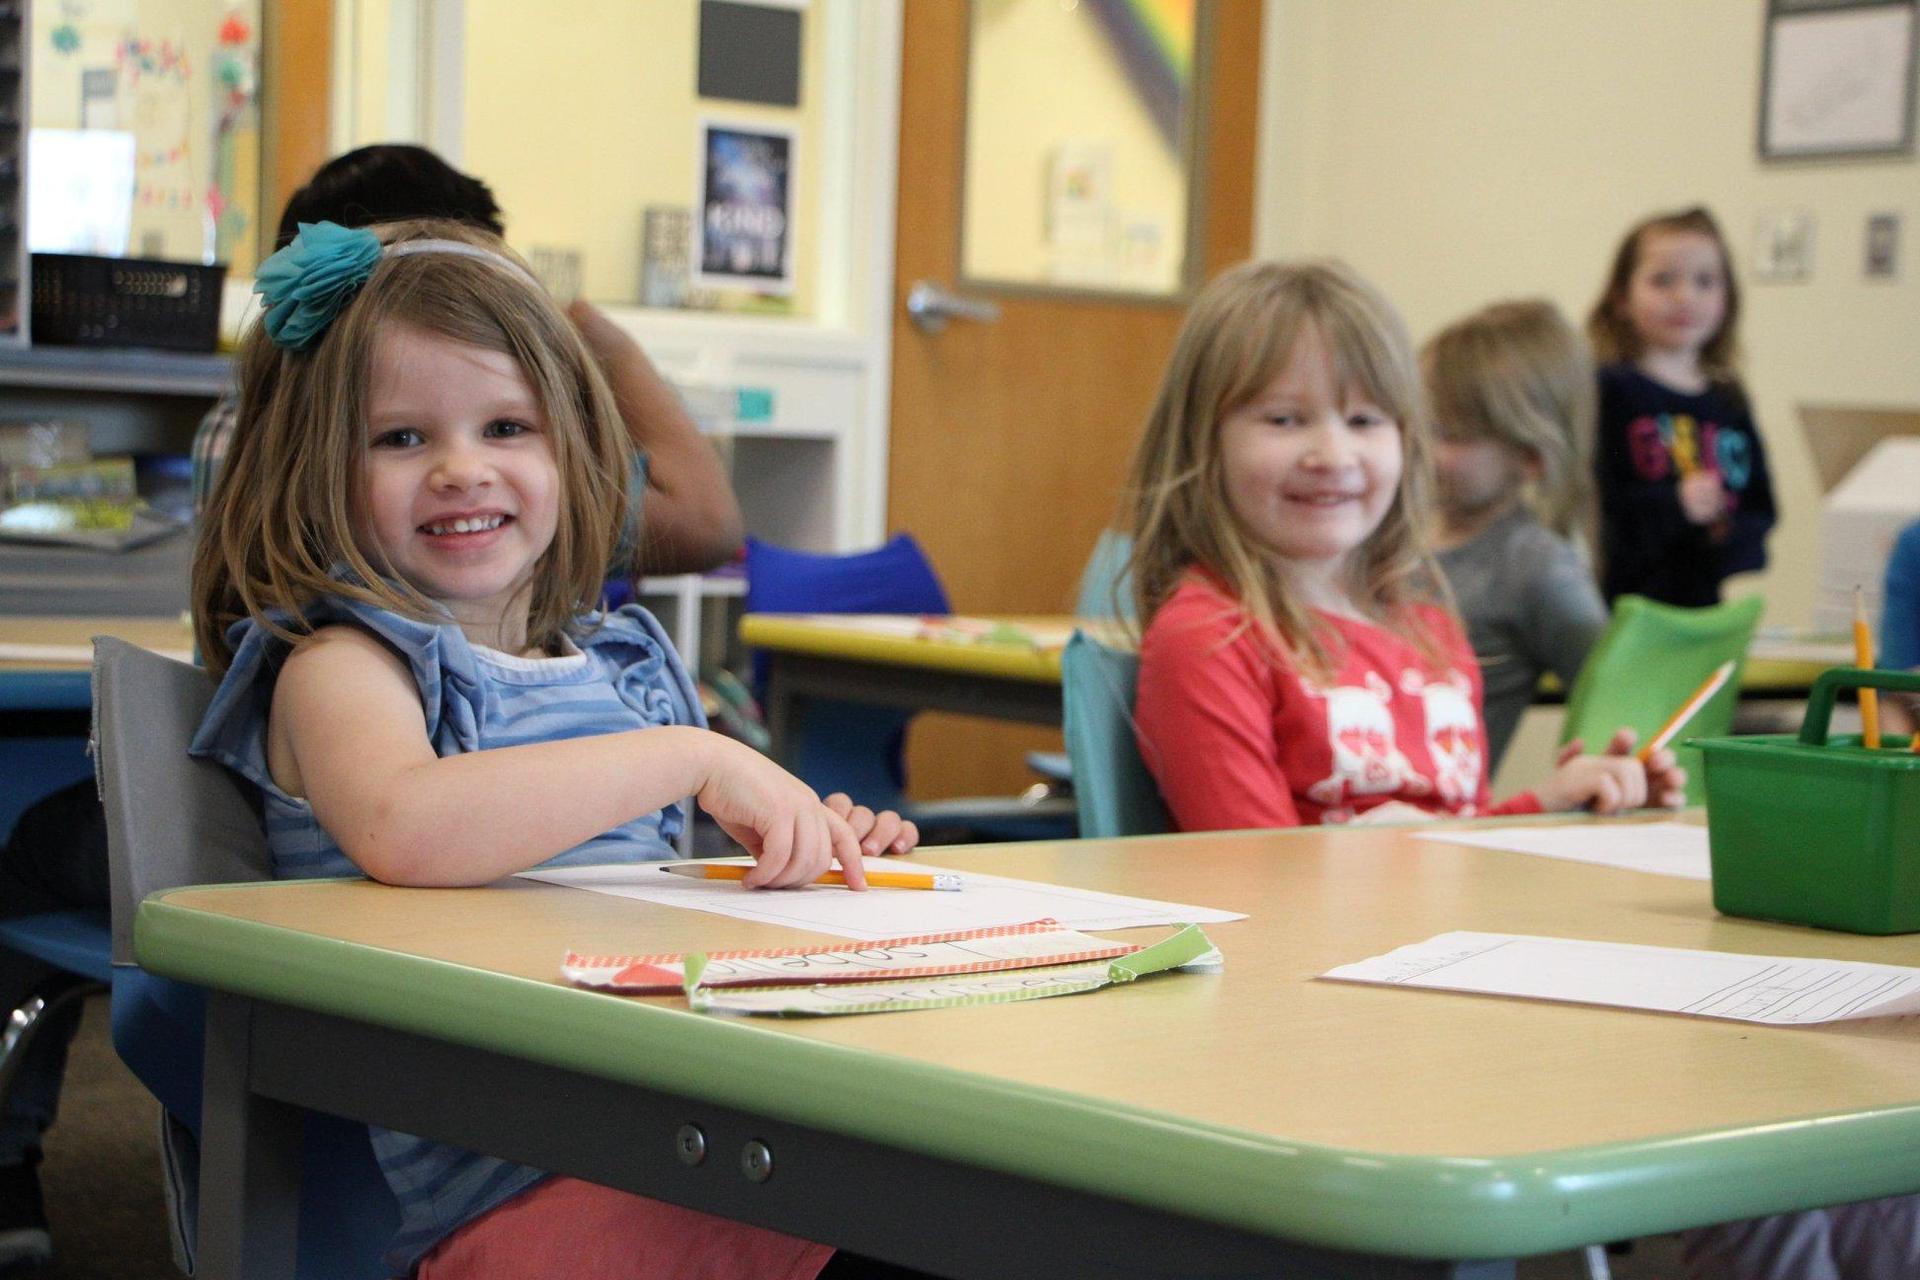 Girls sitting in classroom